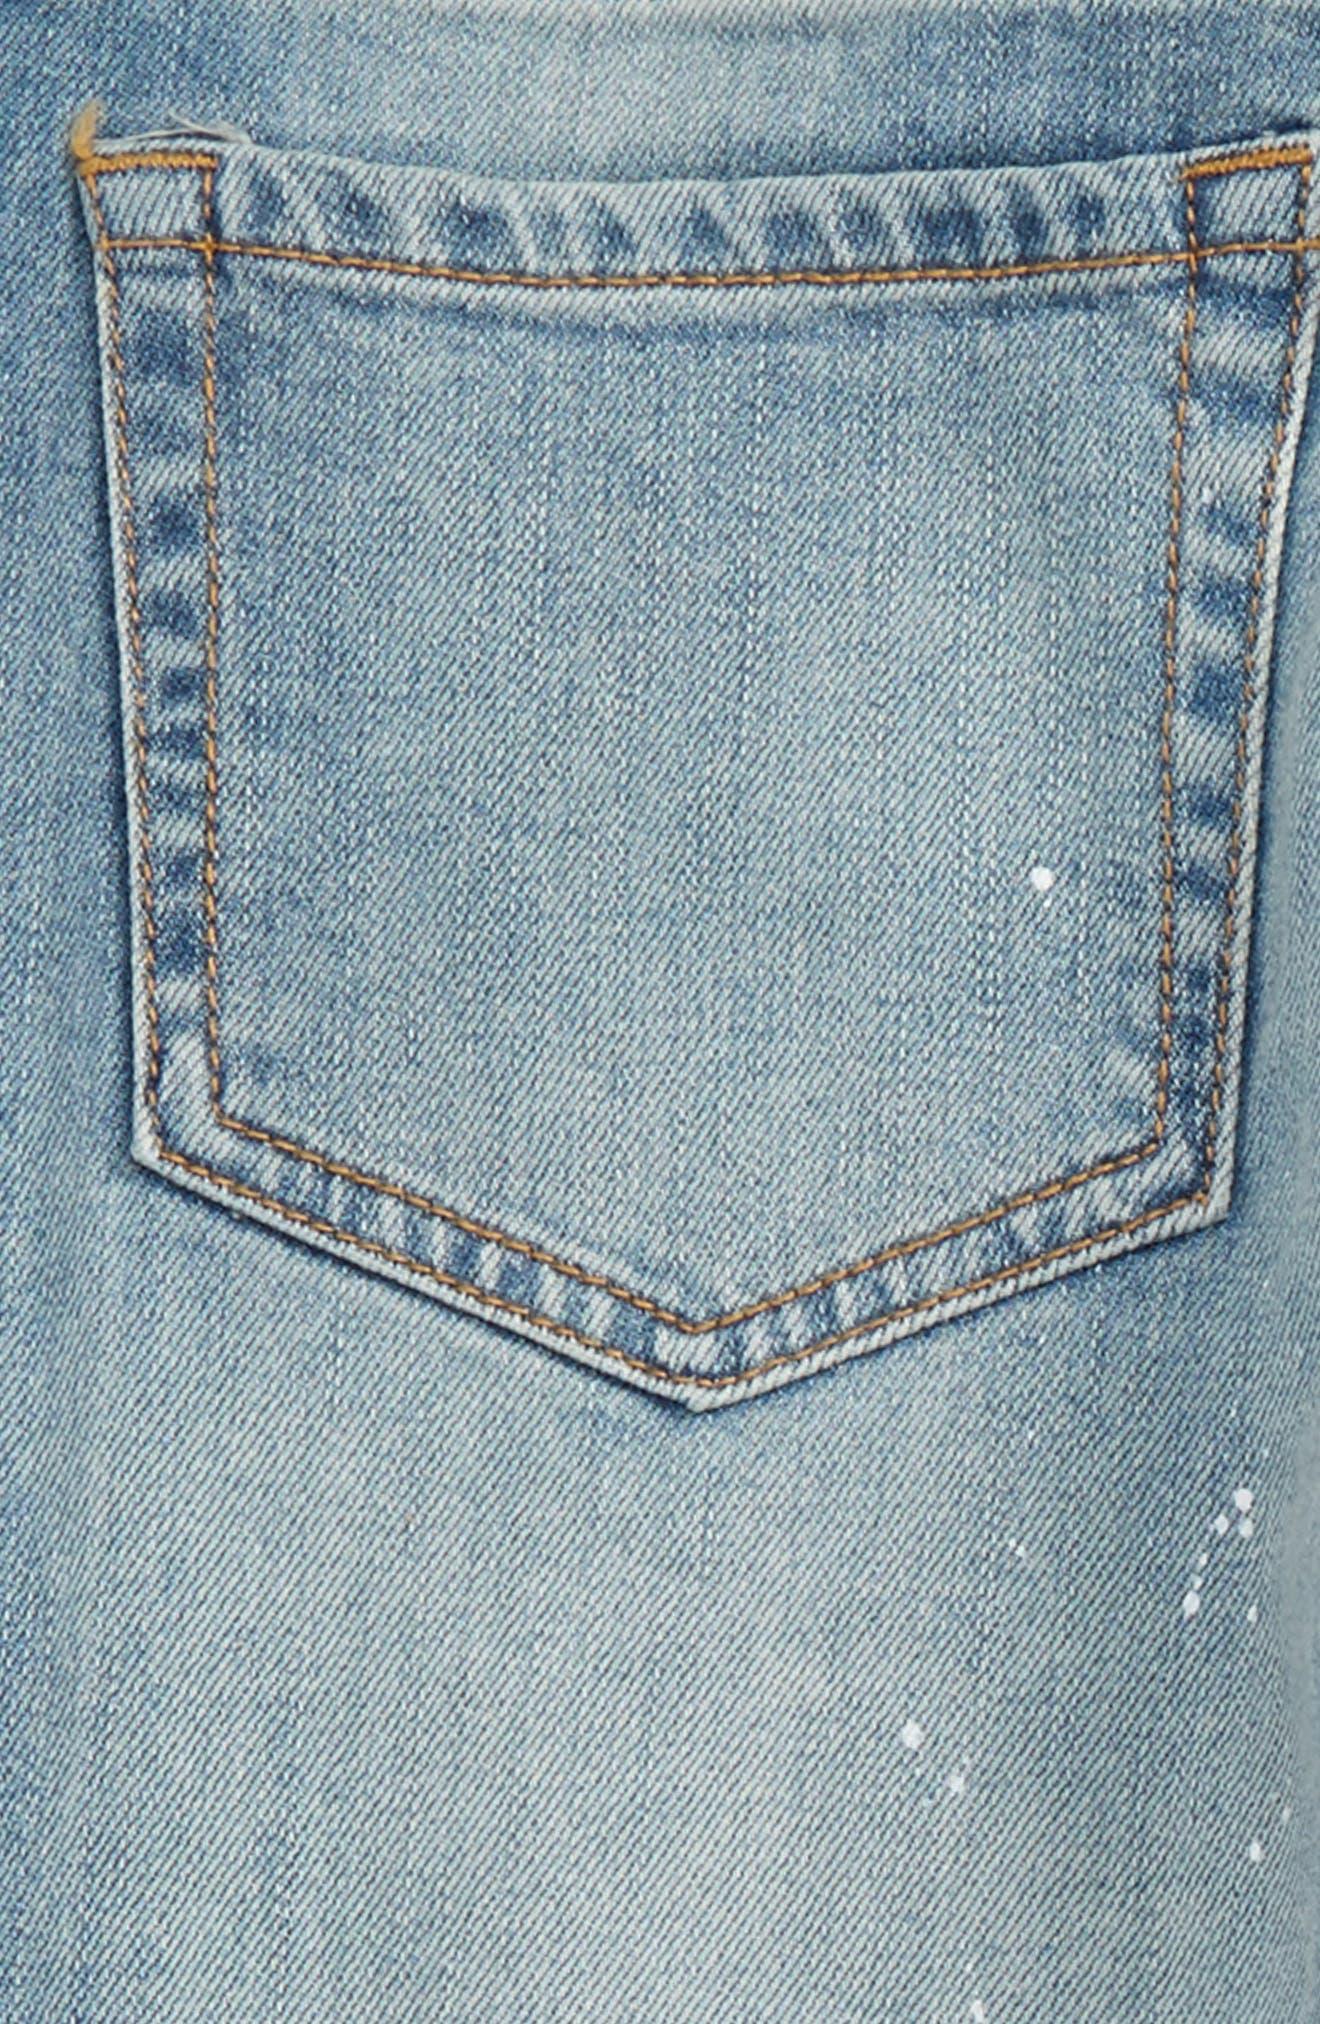 Alternate Image 3  - Treasure & Bond Crop Distressed Girlfriend Jeans (Big Girls)